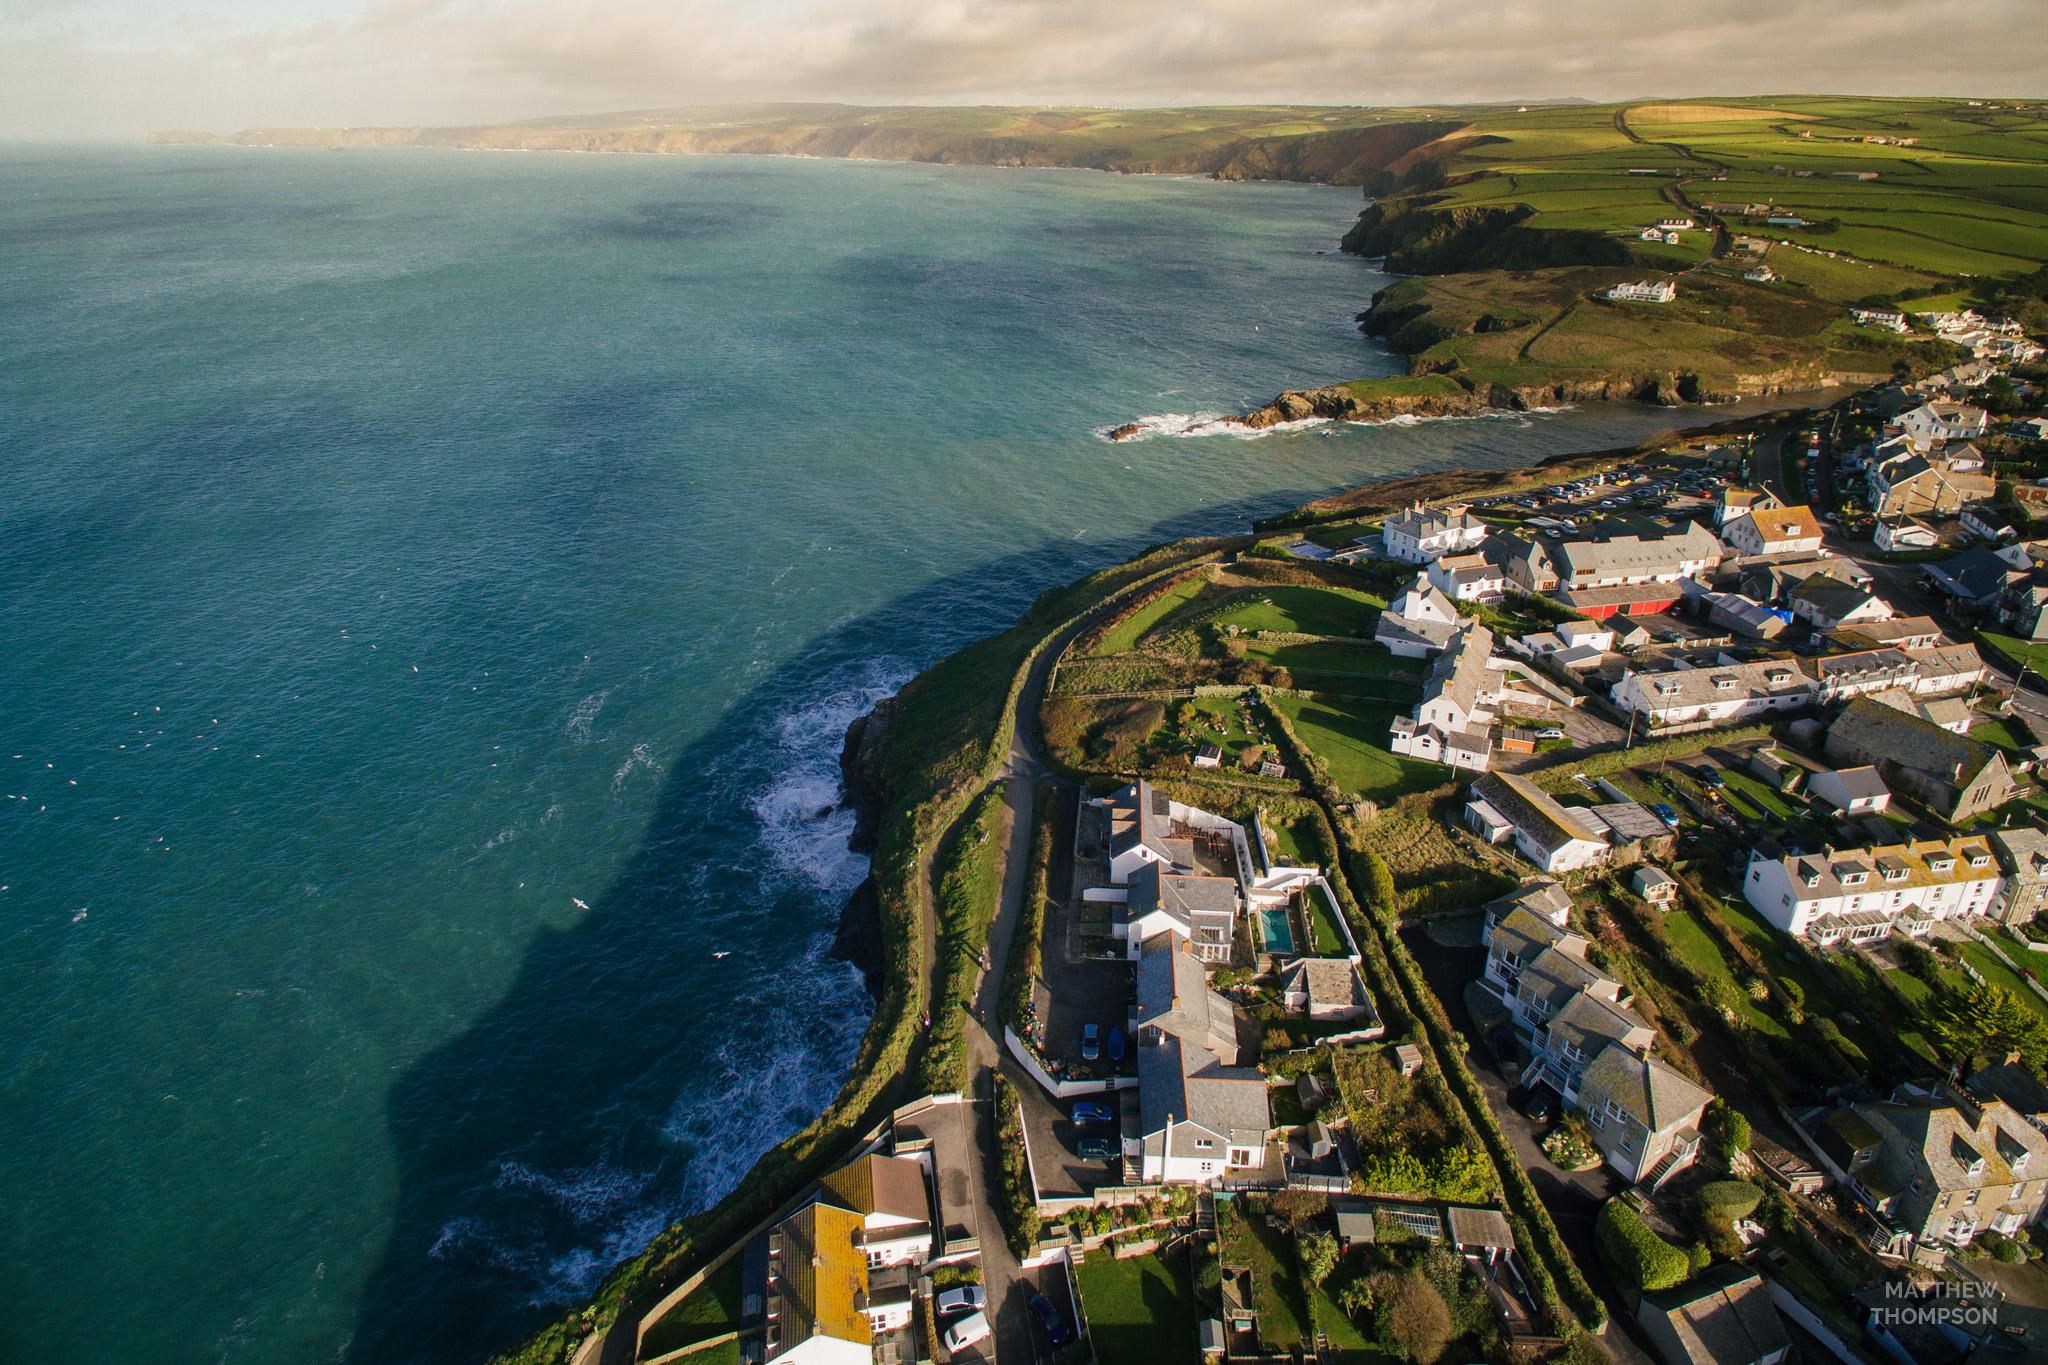 151107-Cornwall-Aerial-19-Edit-W.jpg